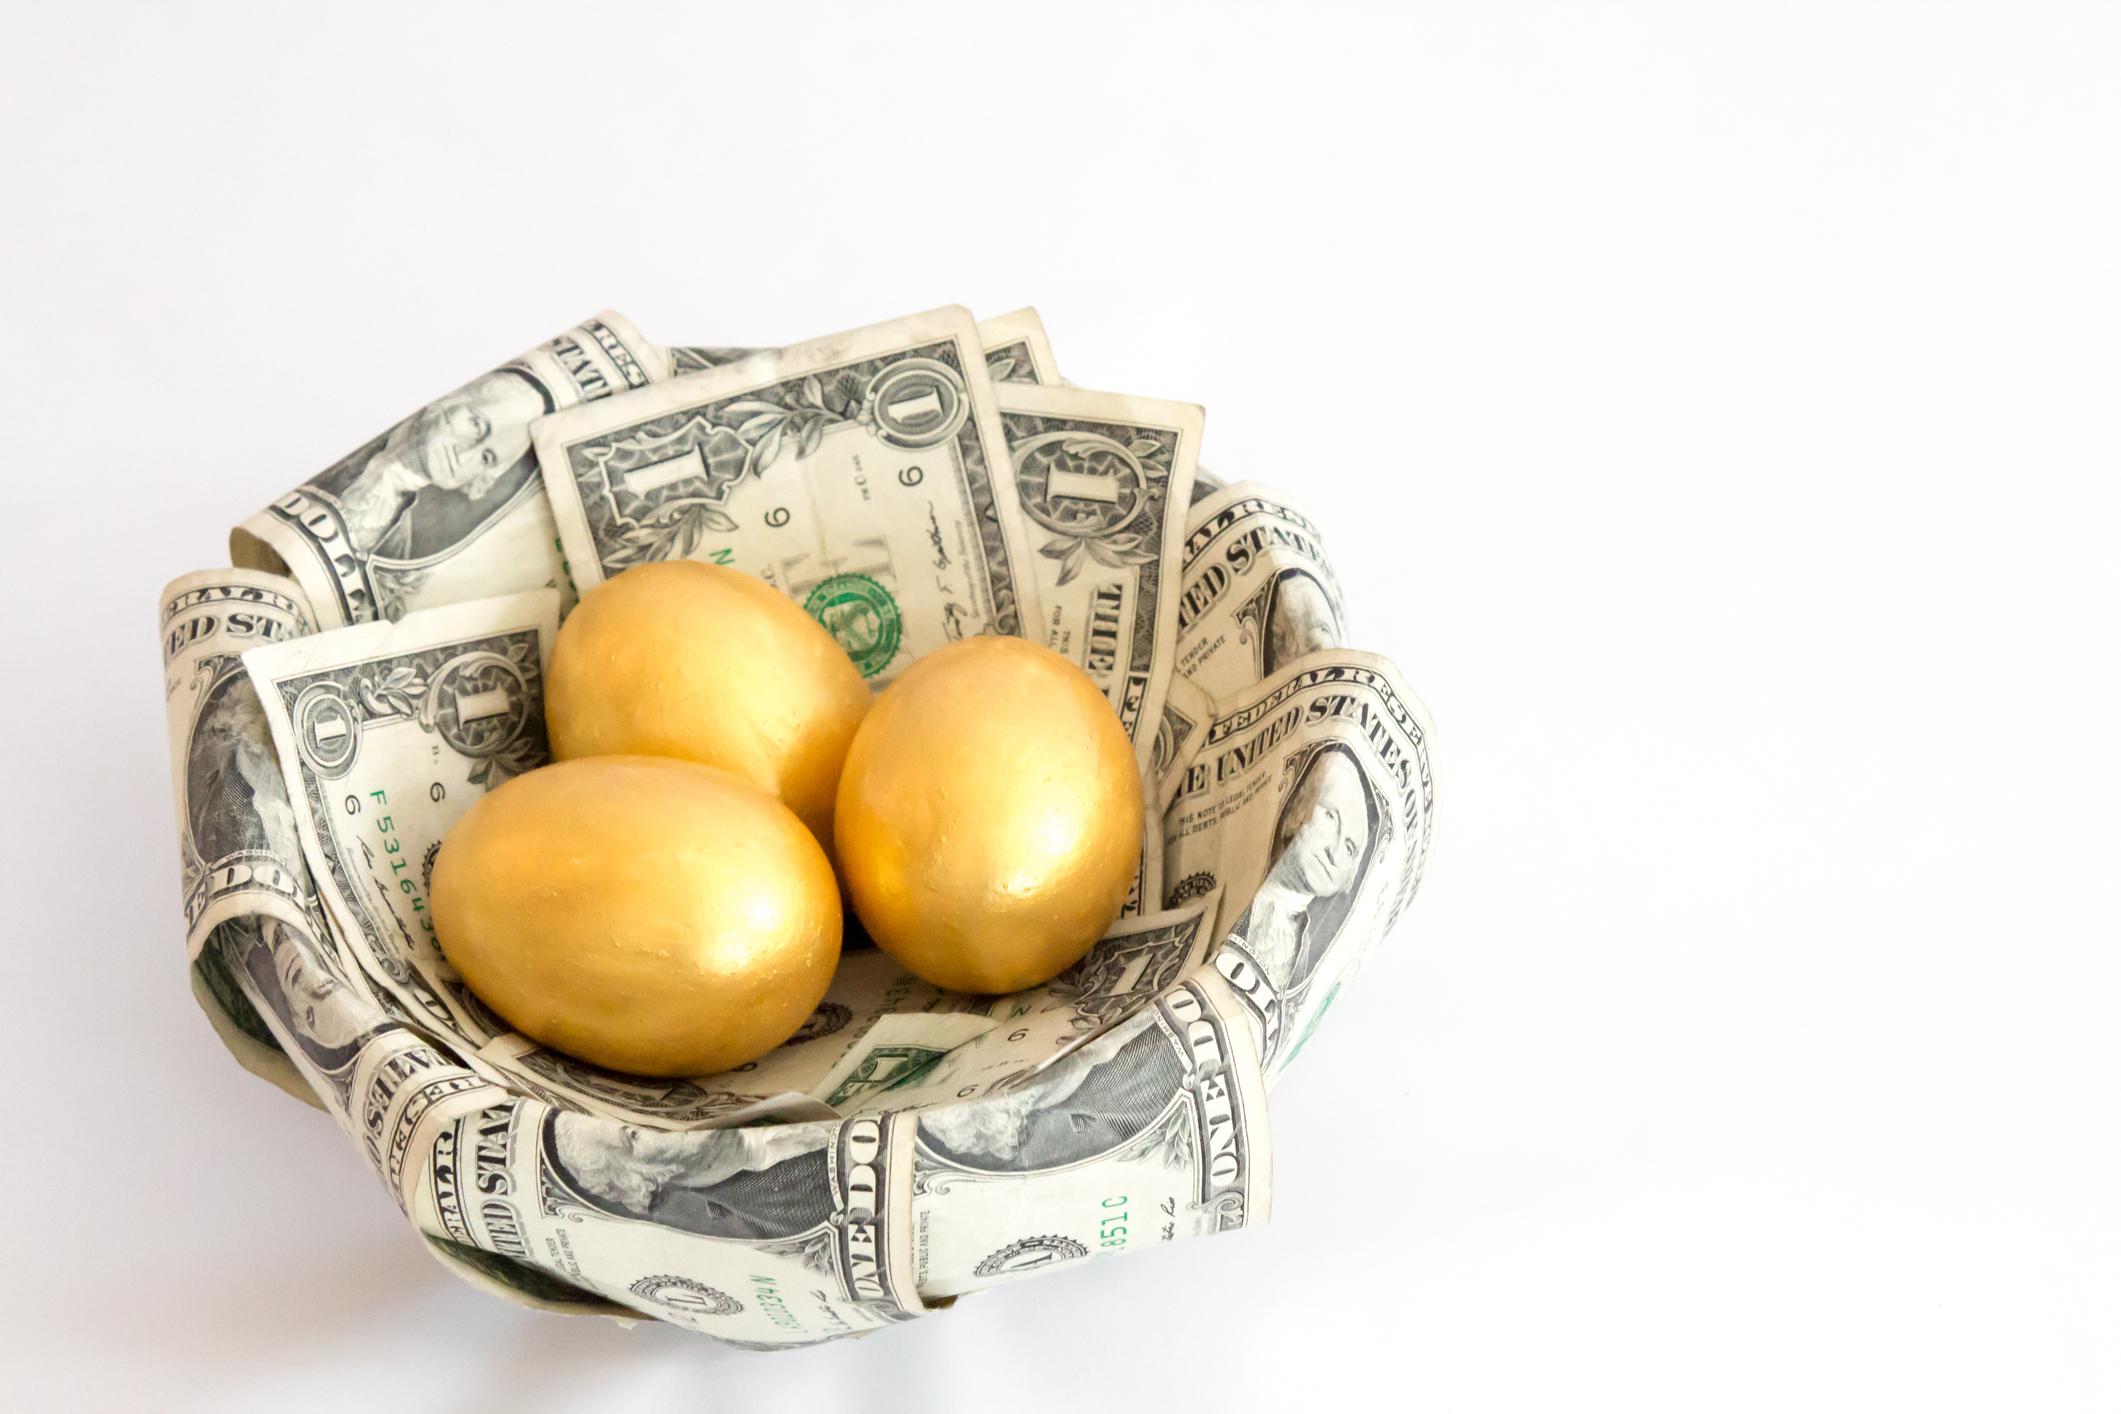 Three golden eggs sitting in a basket made of dollar bills